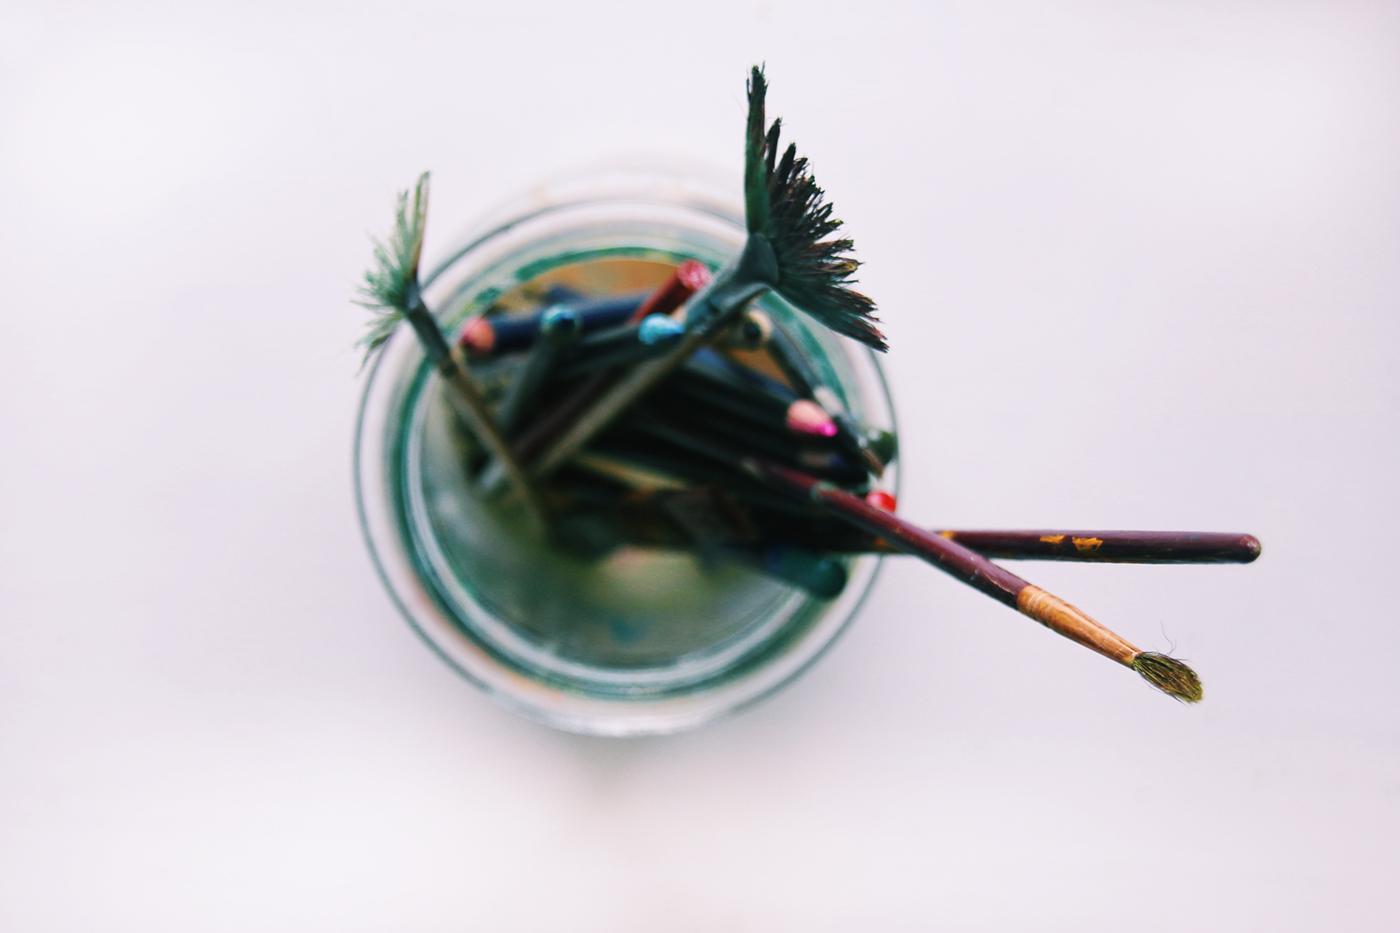 Brushes in a jar